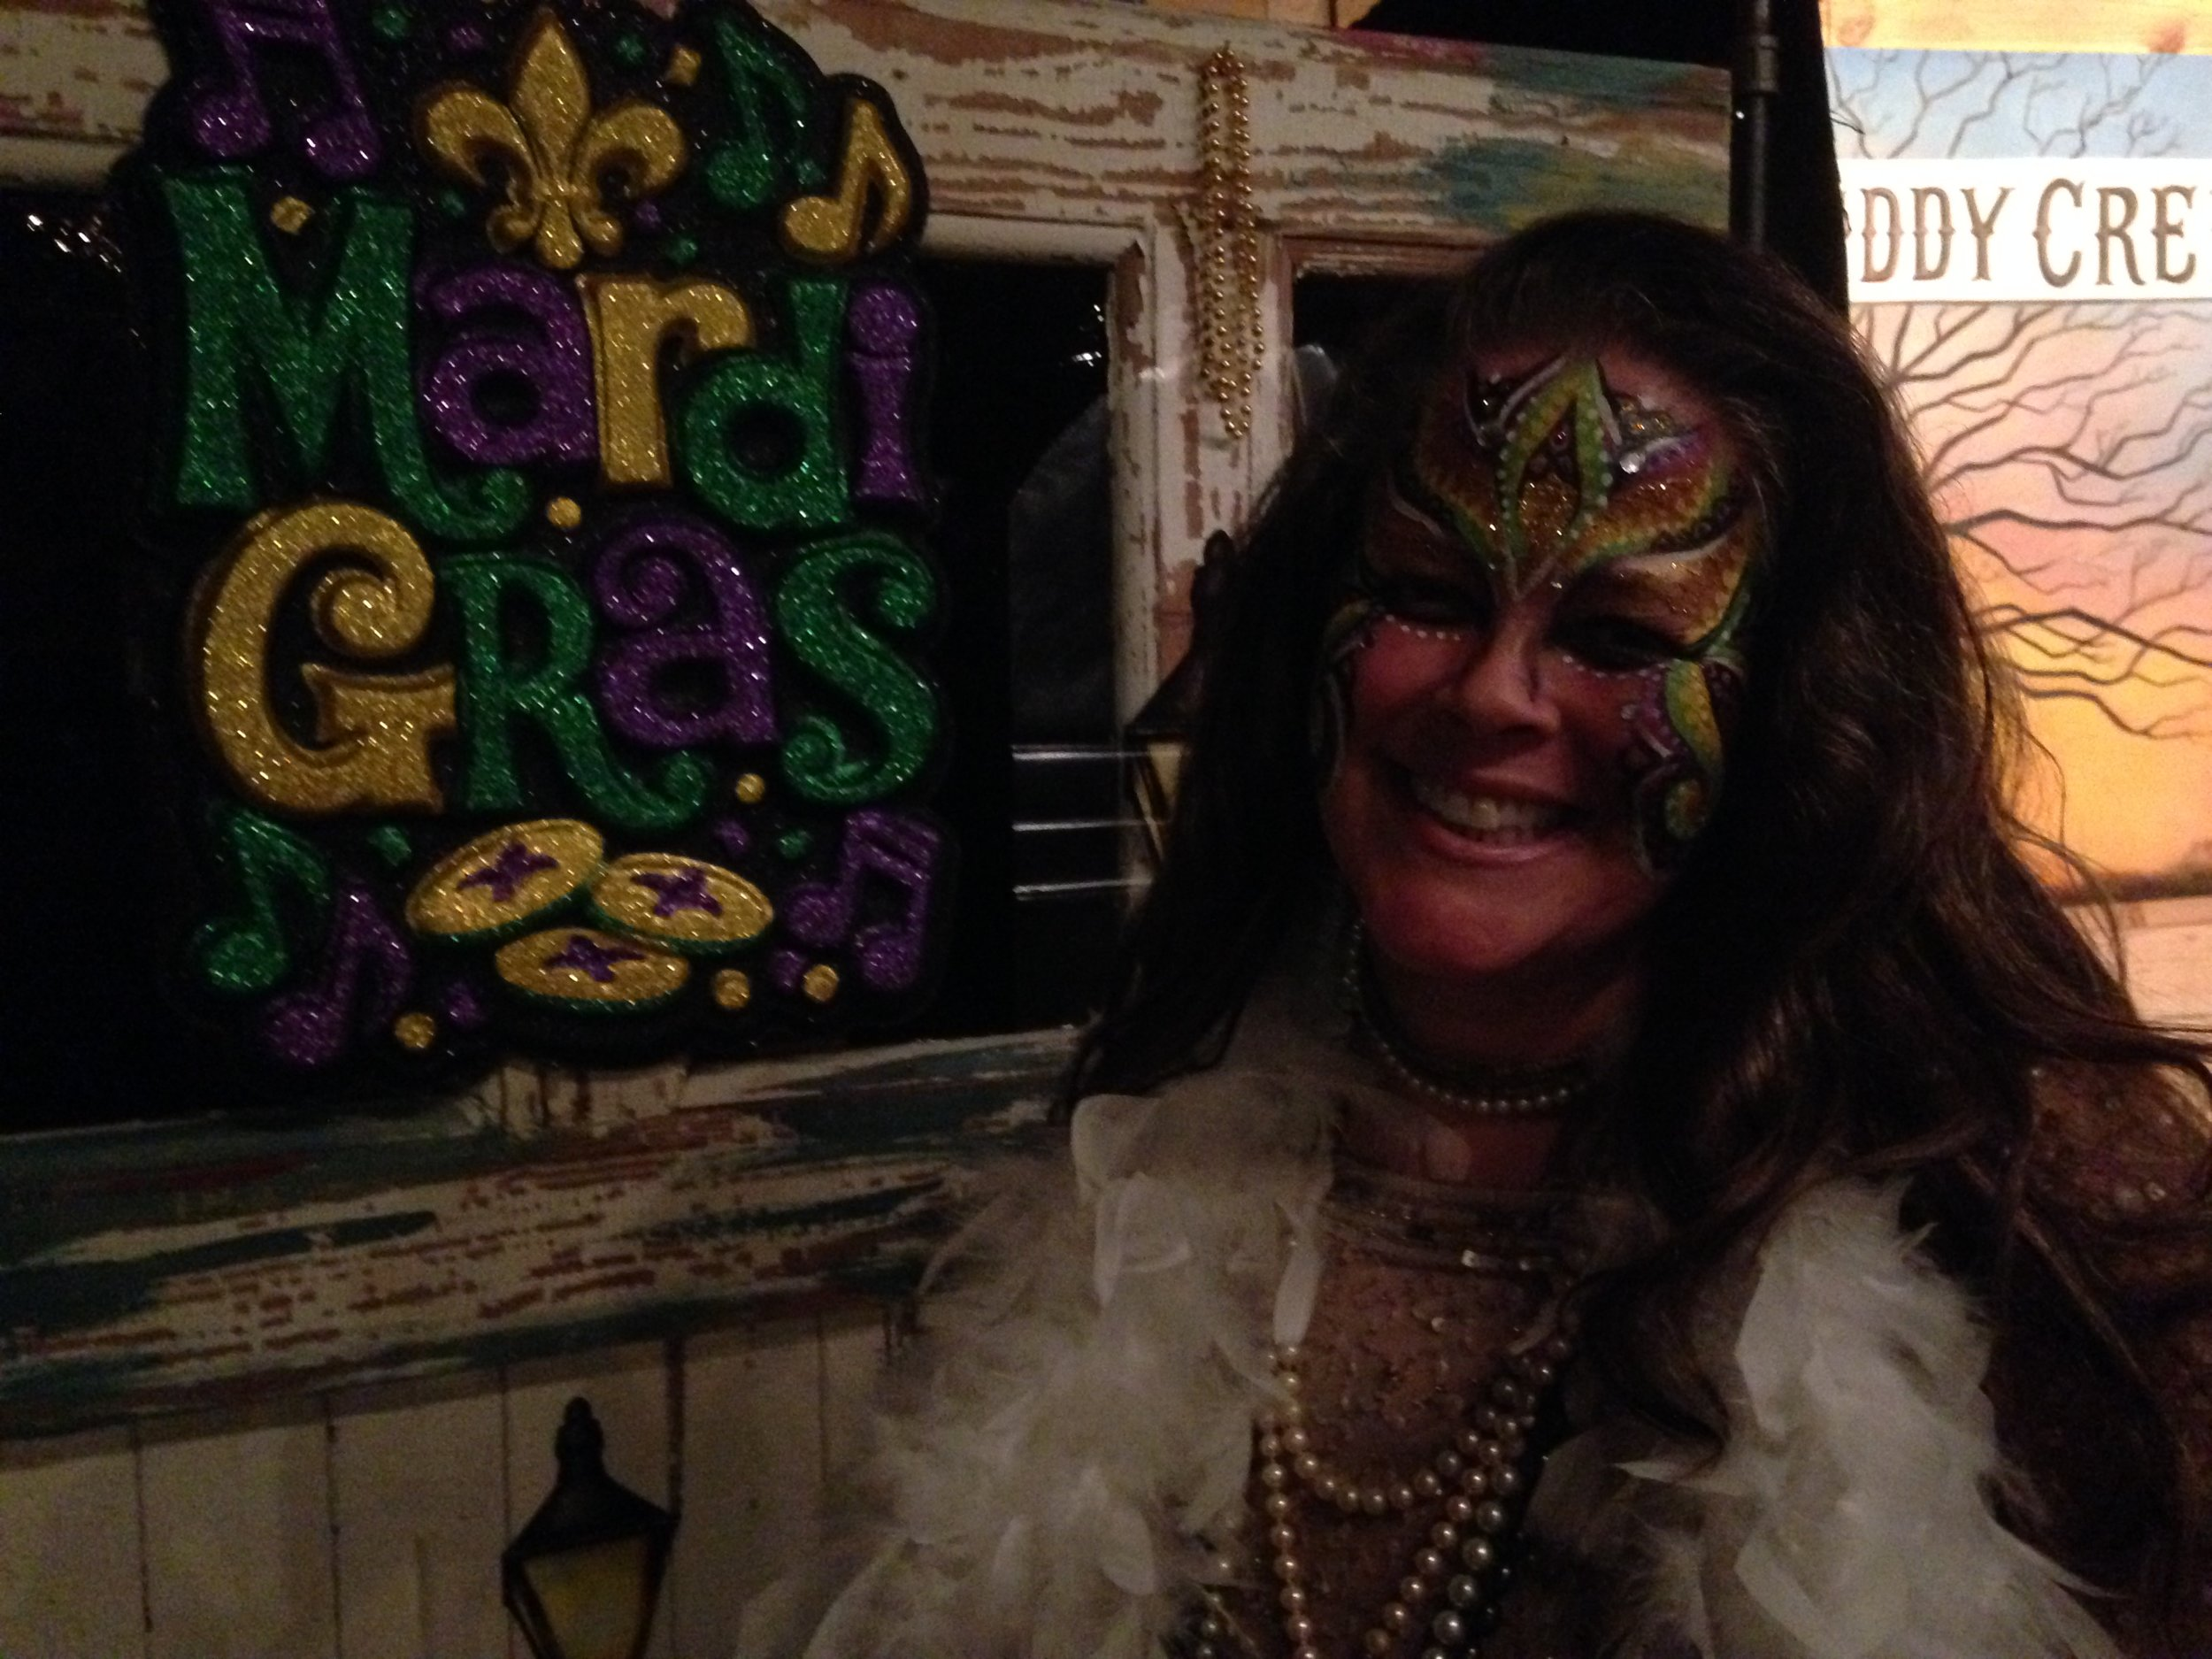 Andrea Templon beaming after a fun show for Mardi Gras at the Muddy Creek Music Hall, Bethania, North Carolina